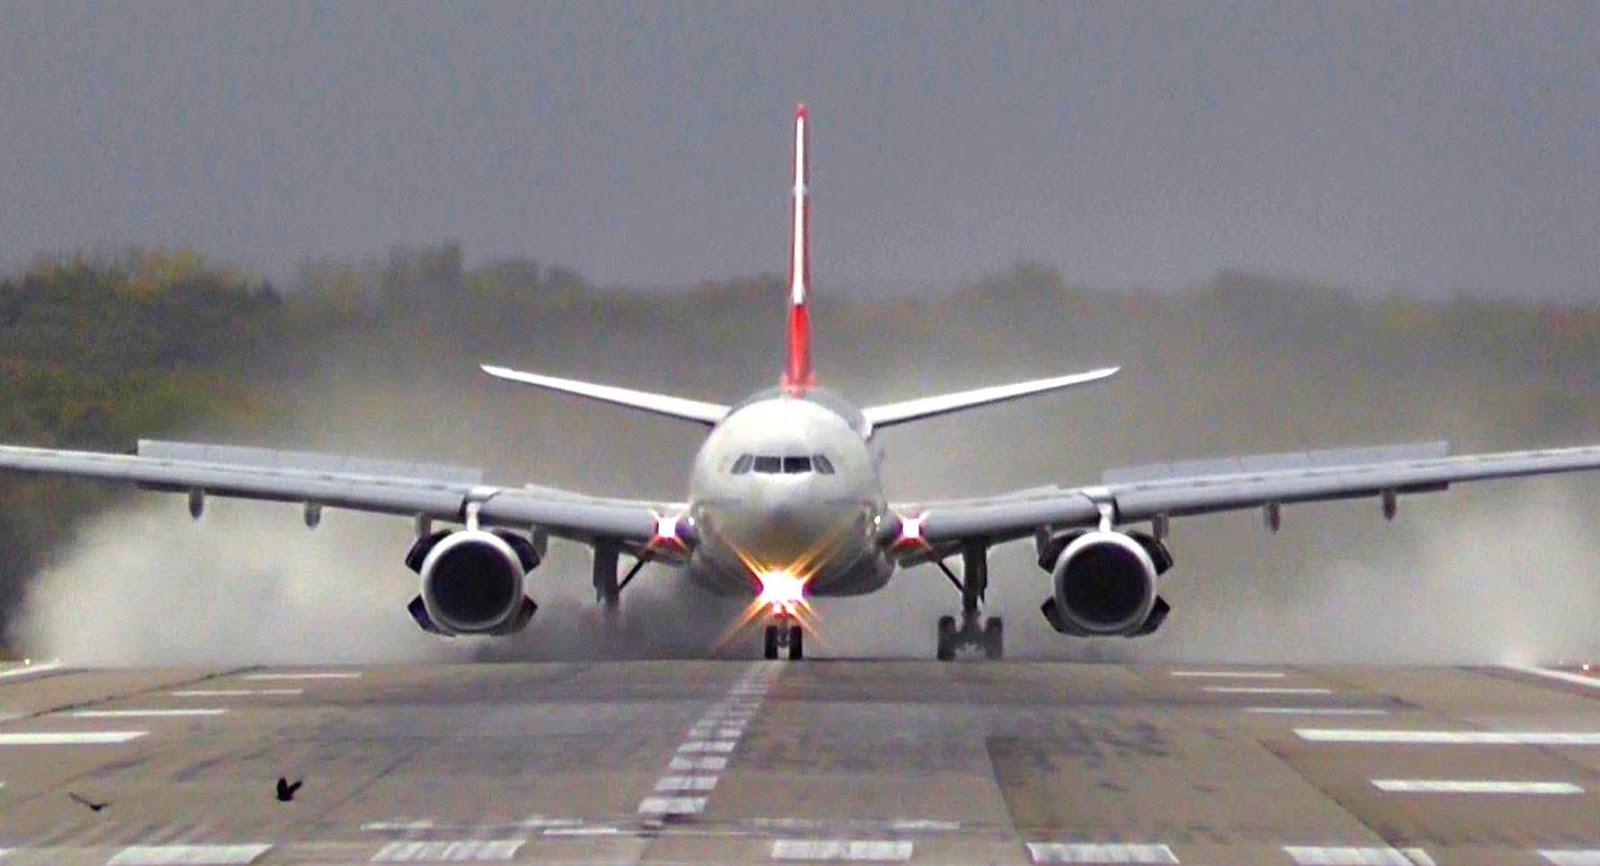 Pilot executes dangerous sideways landing at UK airport during storm